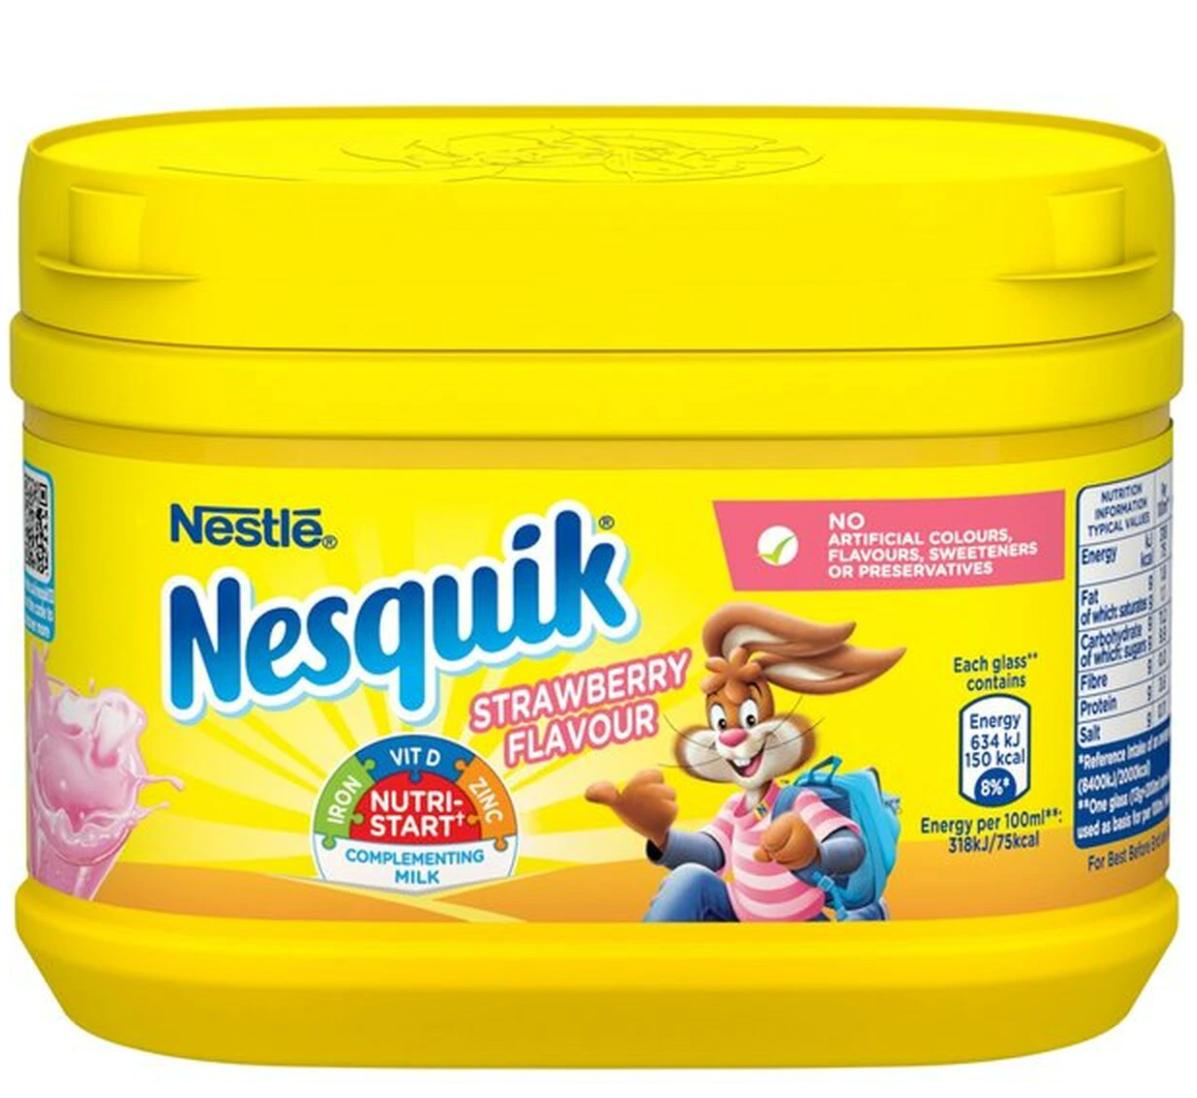 Nesquik Strawberry Flavour Milkshake Mix 300g